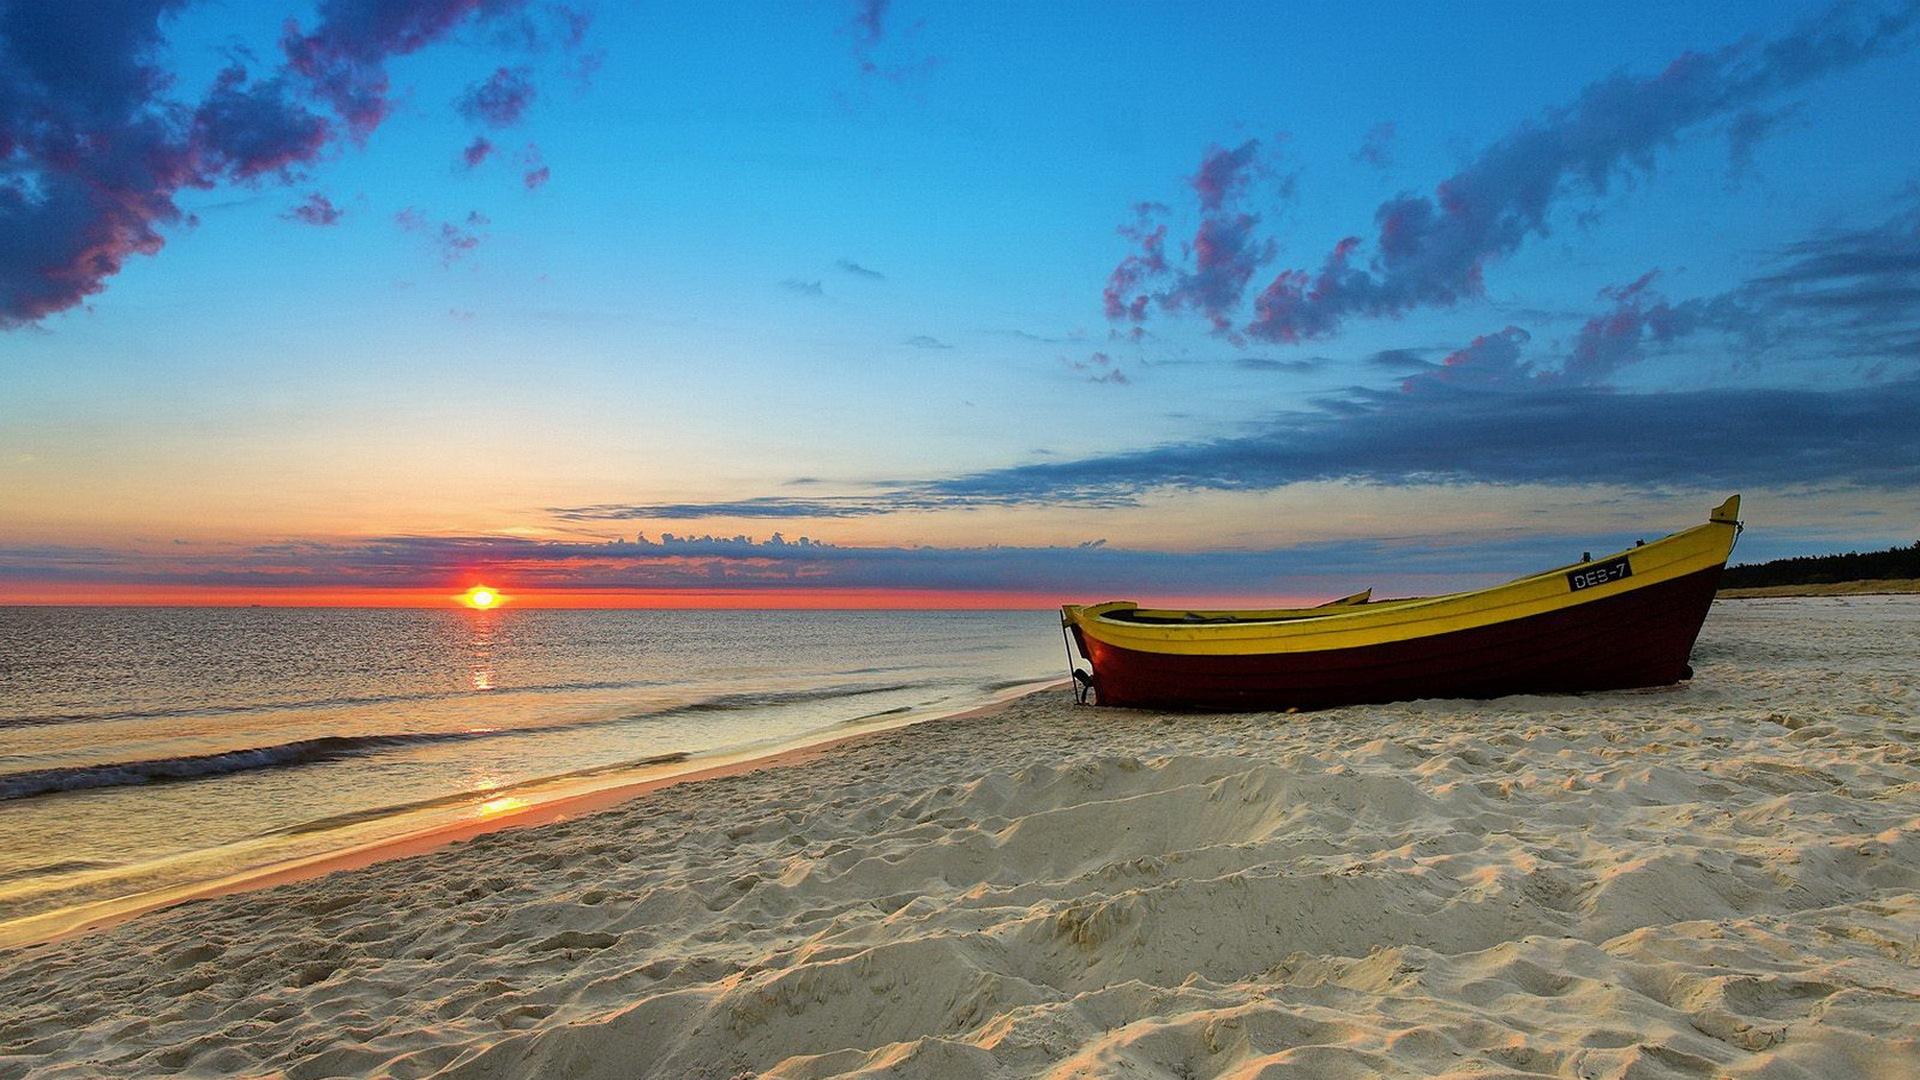 hd resolutionssea beach - photo #10